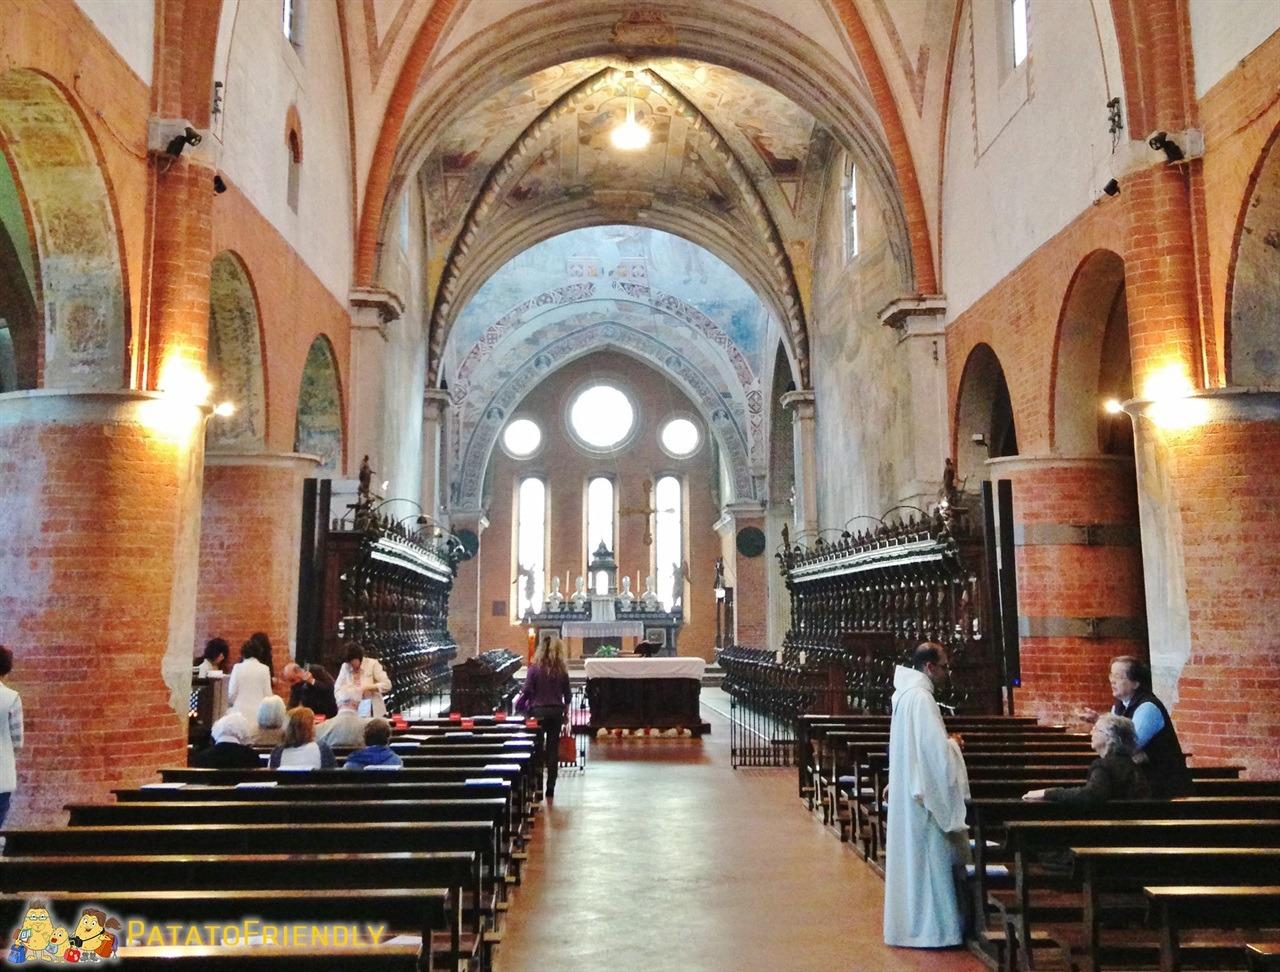 [cml_media_alt id='6061']L'abbazia di Chiaravalle - Gli splendidi interni[/cml_media_alt]